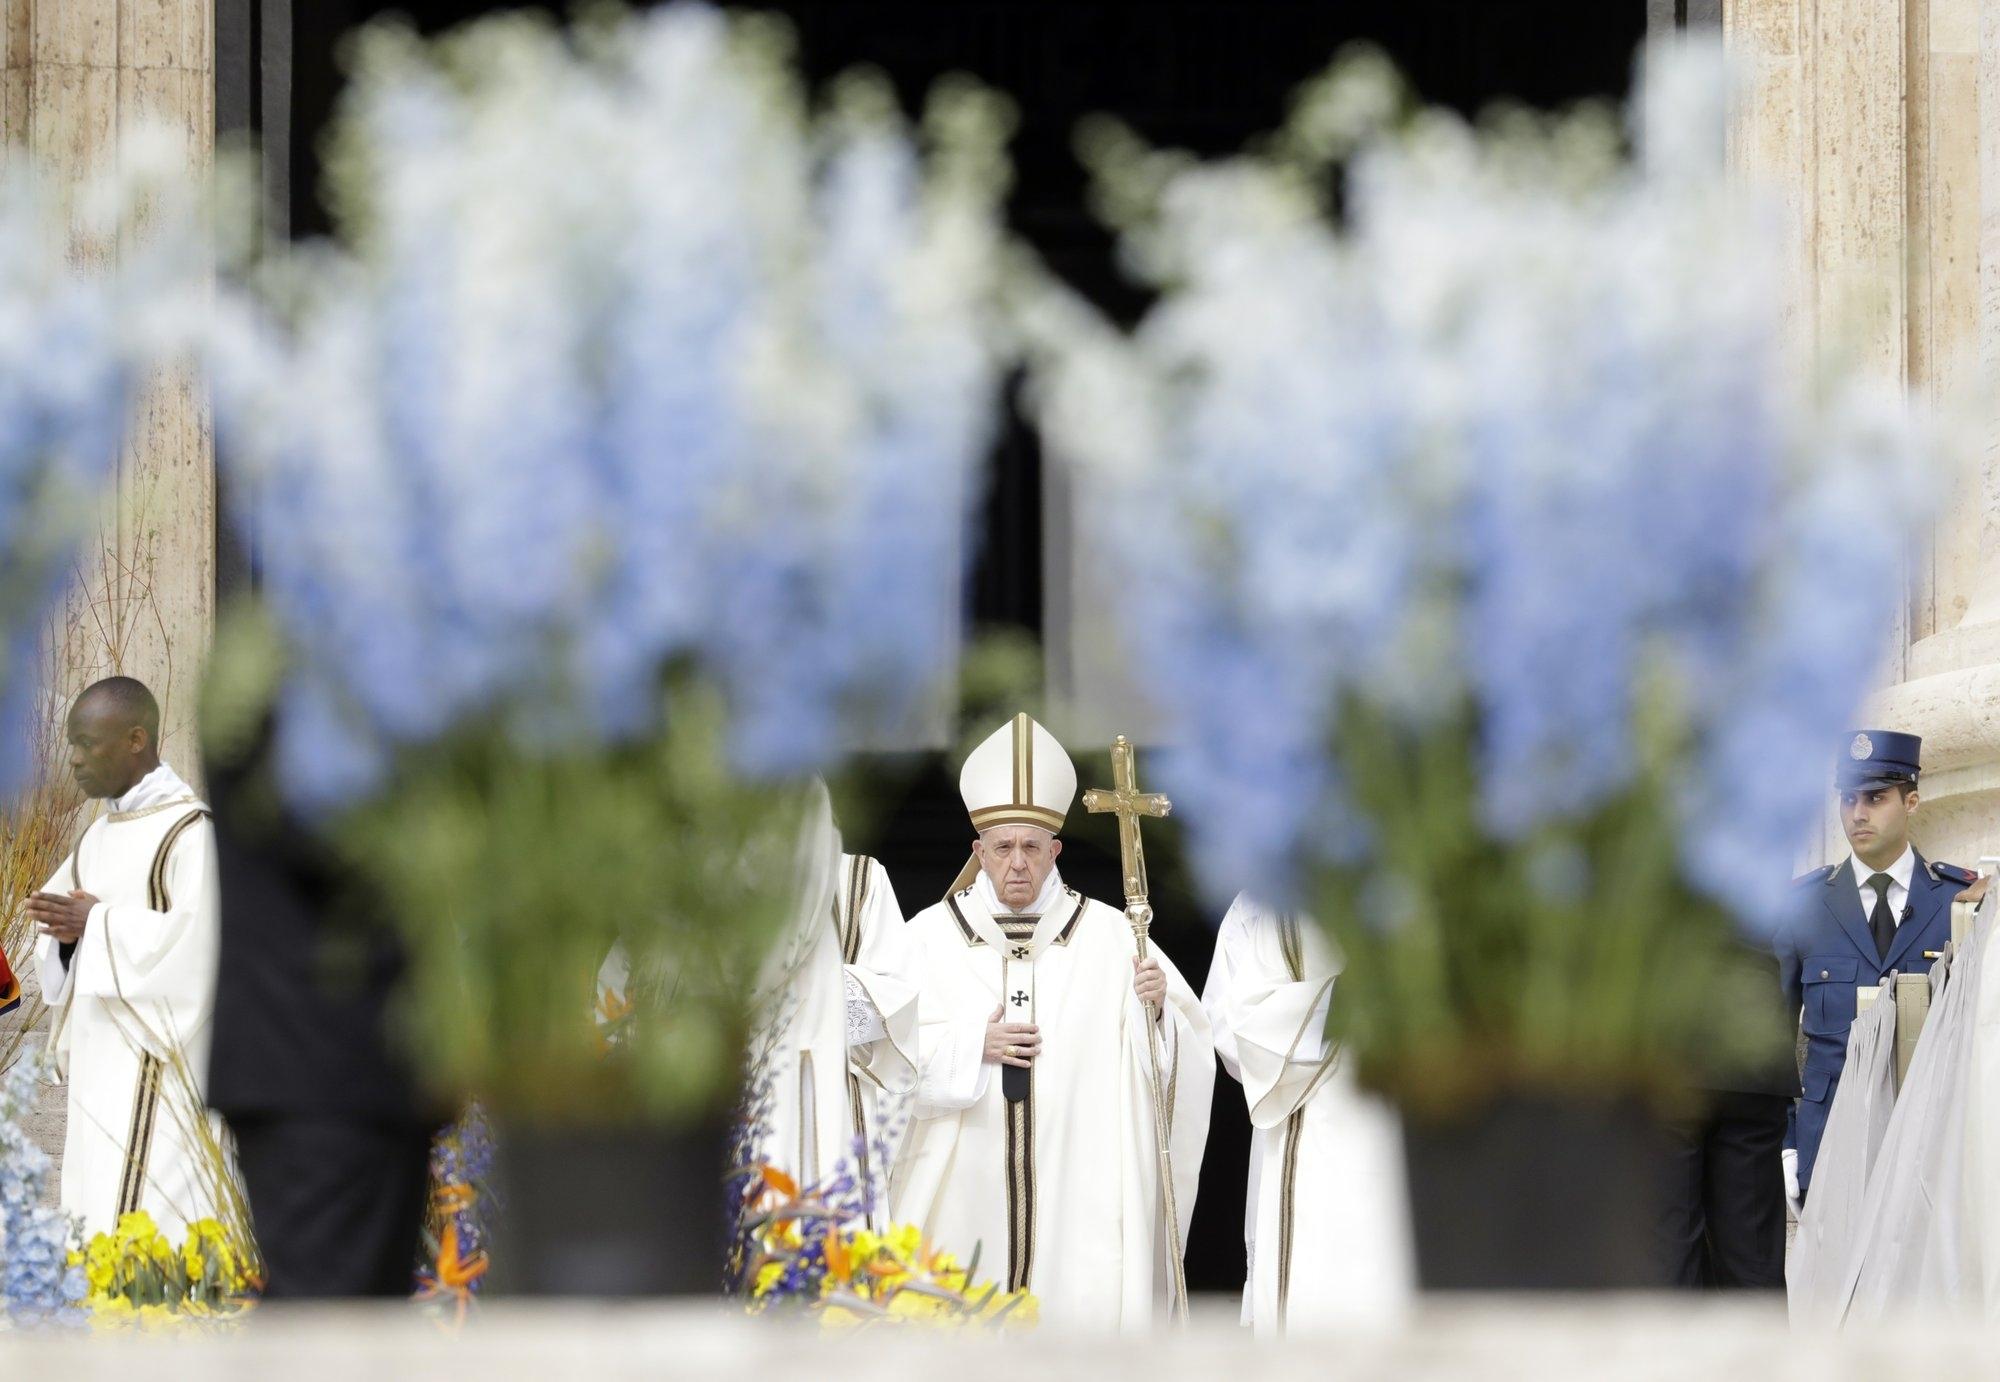 Pope Denounces 'cruel Violence' Of Sri Lanka Easter Attack | Loop News intended for Liturgical Calendar In Sri Lanka